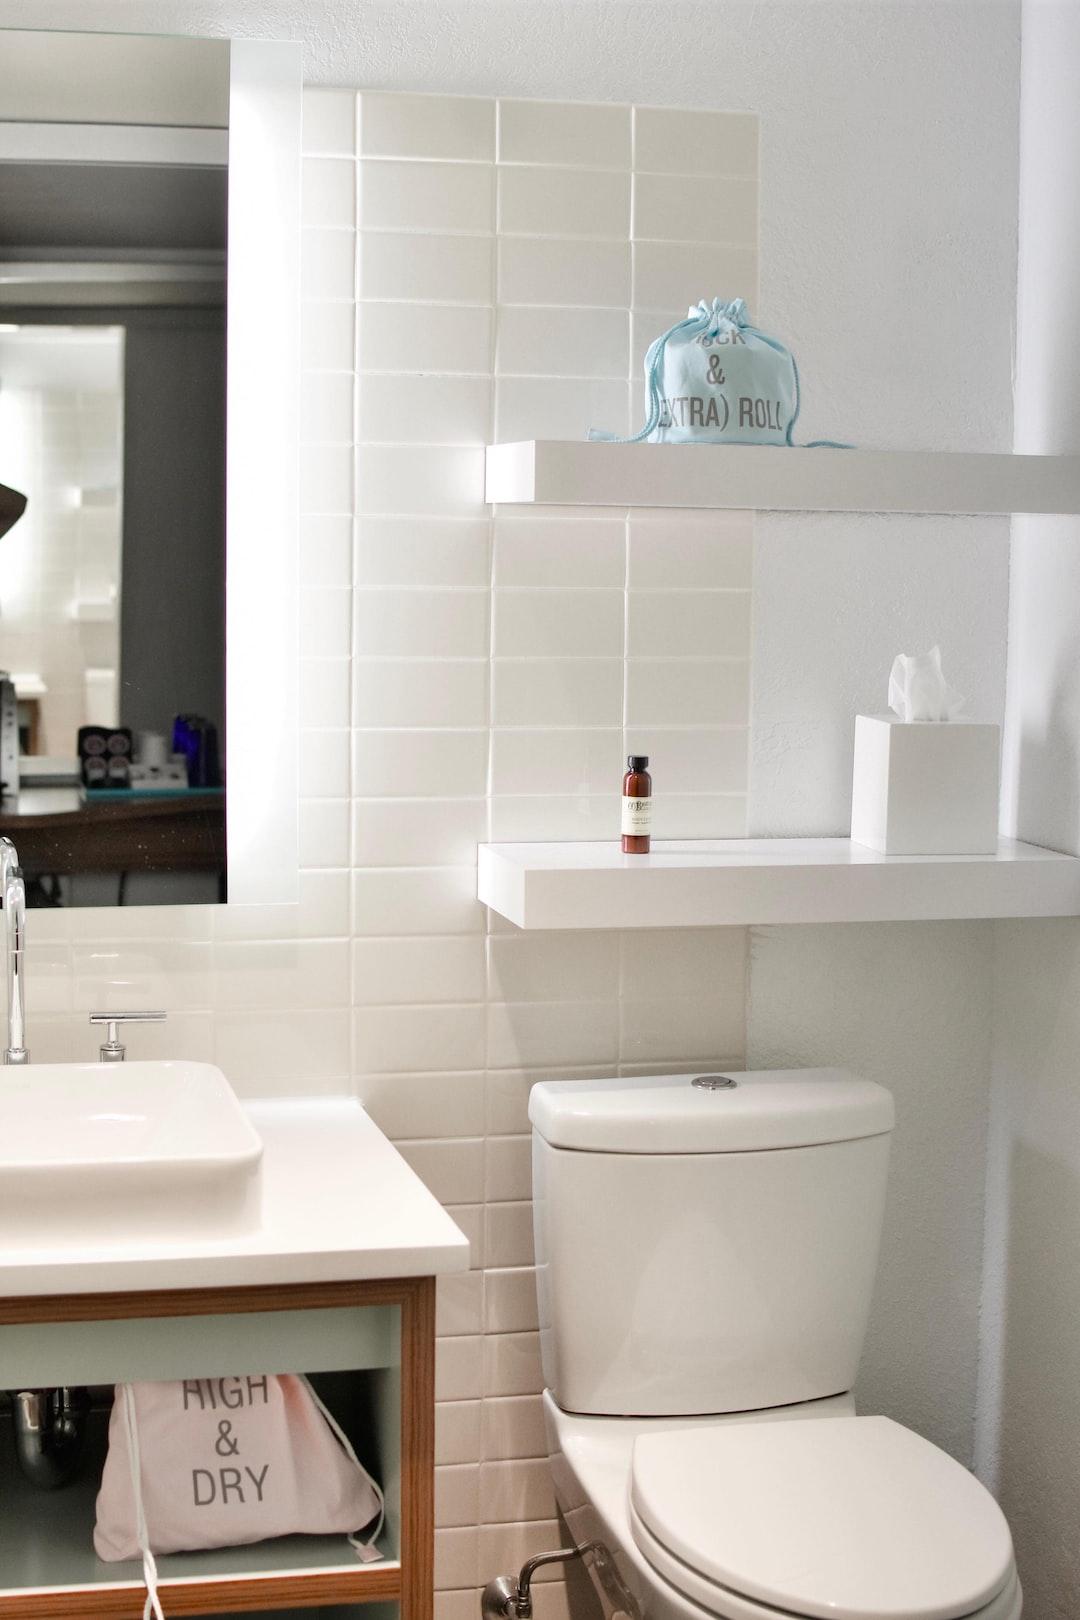 Bathroom interior design boutique hotel in the city.